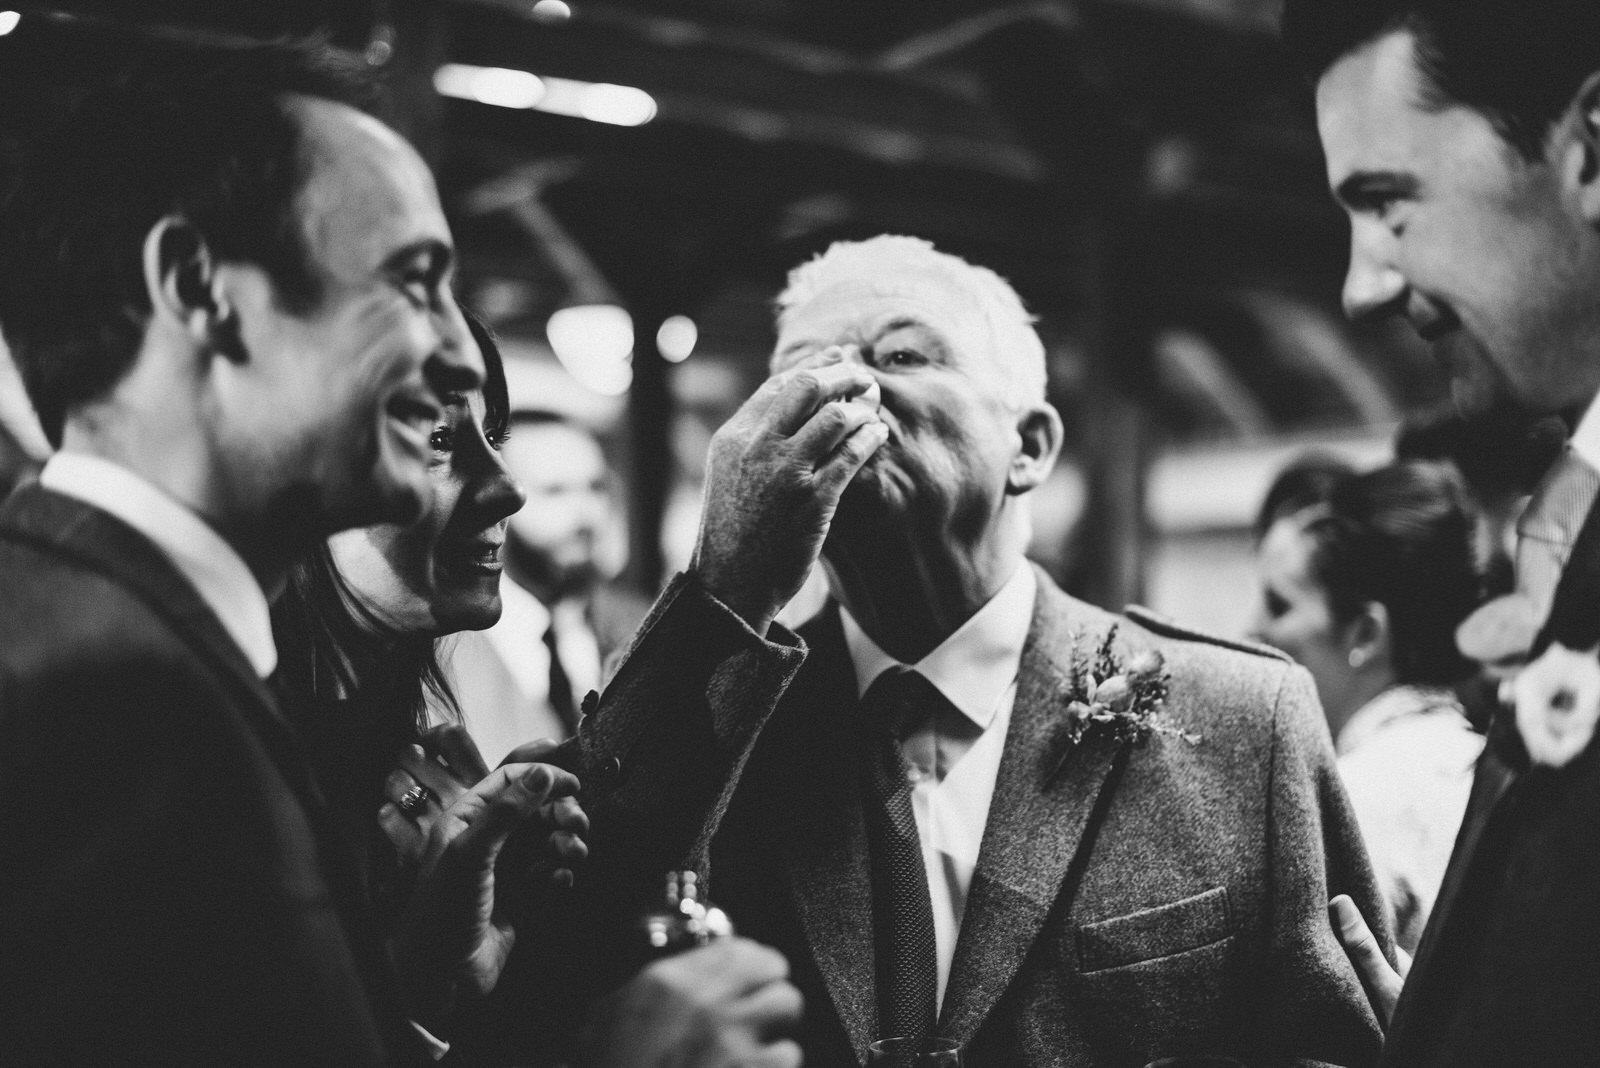 033-GUARDSWELL-FARM-WEDDING-ALTERNATIVE-SCOTTISH-WEDDING-PHOTOGRAPHER-SCOTTISH-WEDDING-DESTINATION-WEDDING-PHOTOGRAPHER.JPG